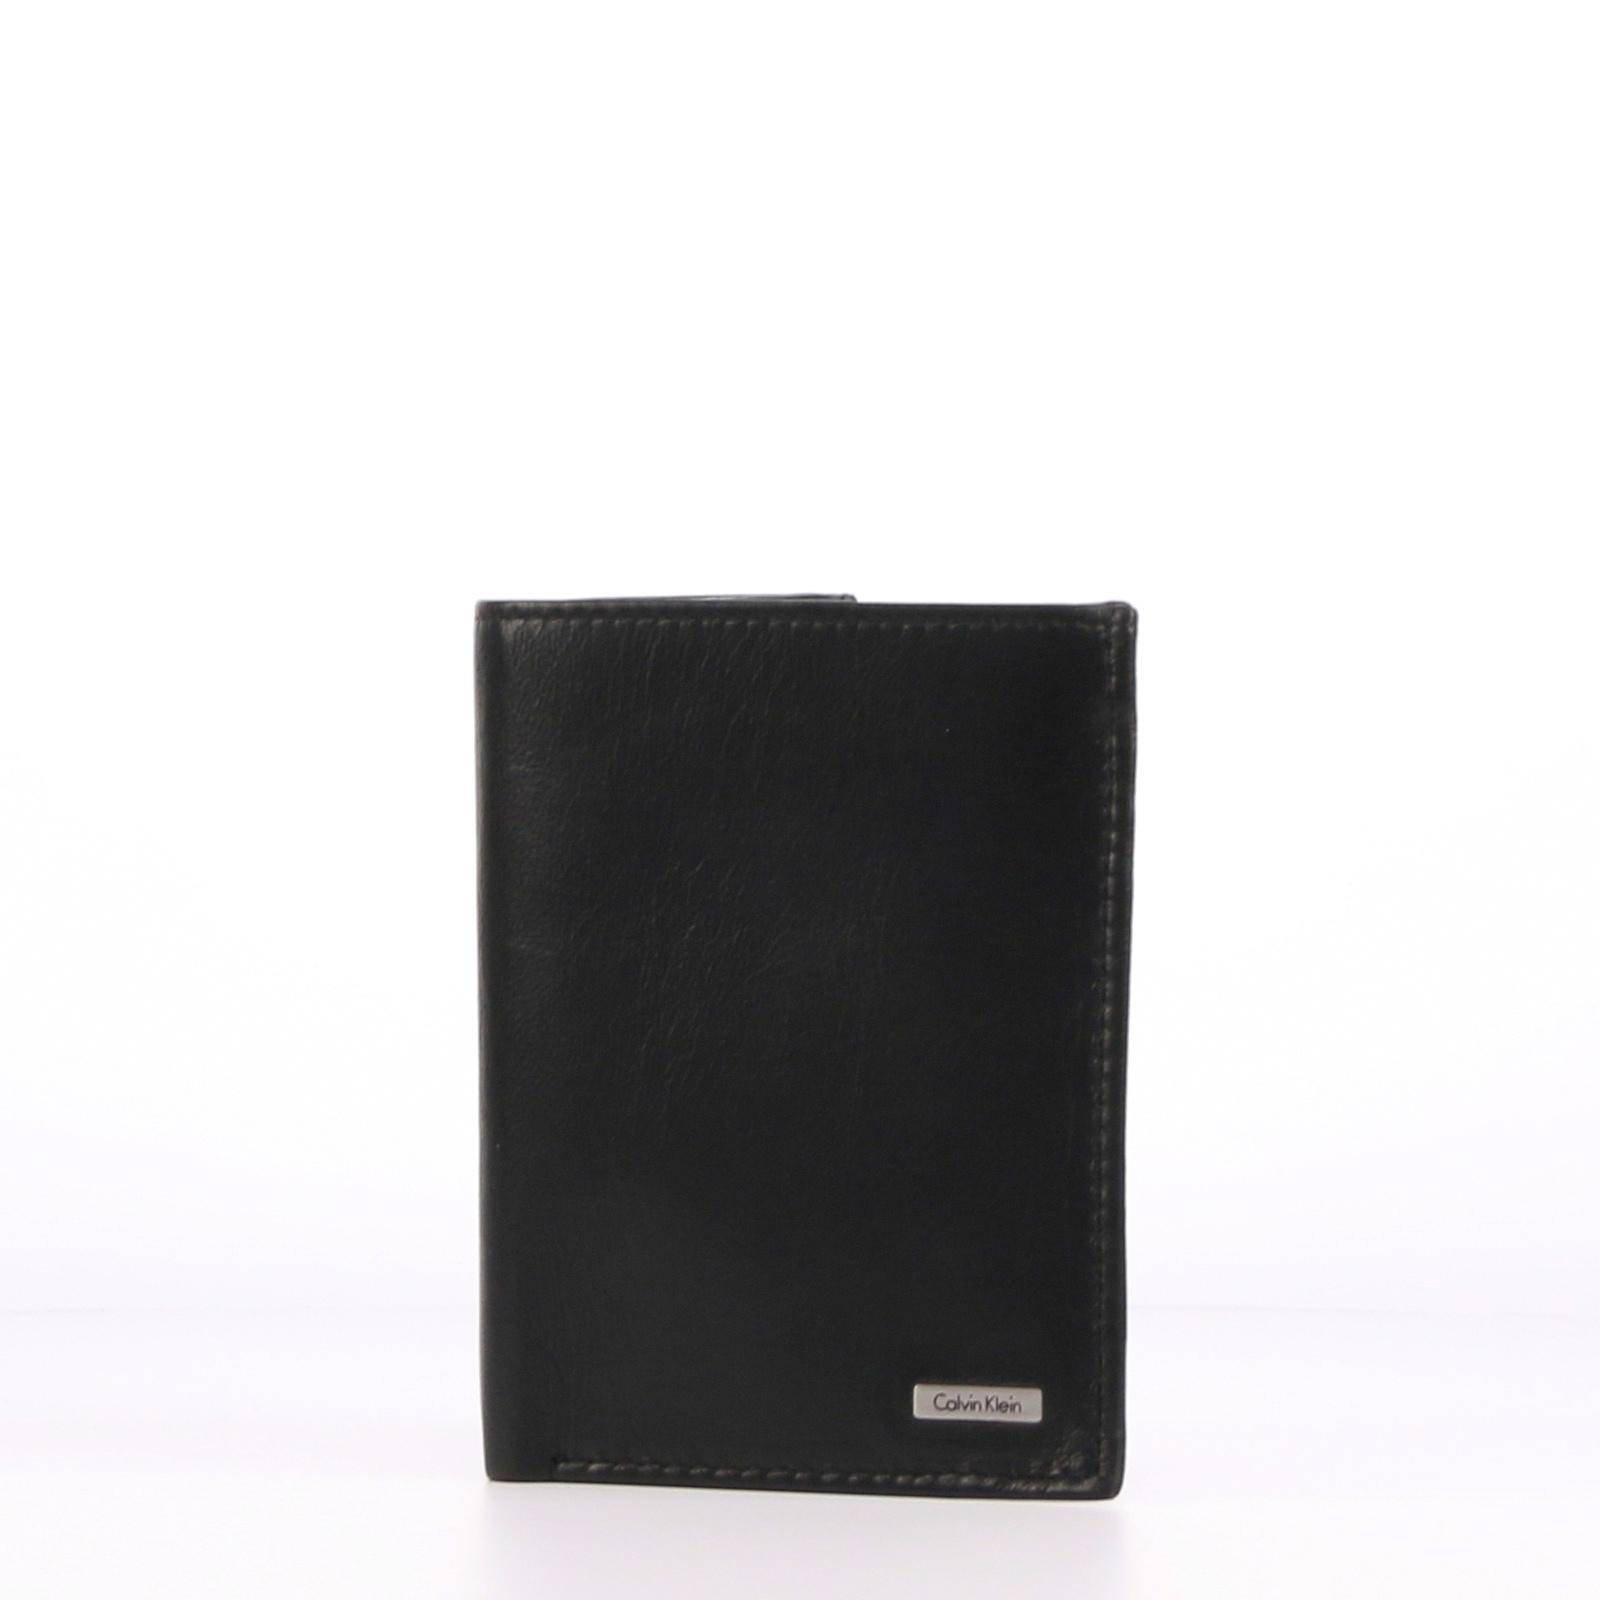 b301449e04d Calvin Klein portemonnee   wehkamp